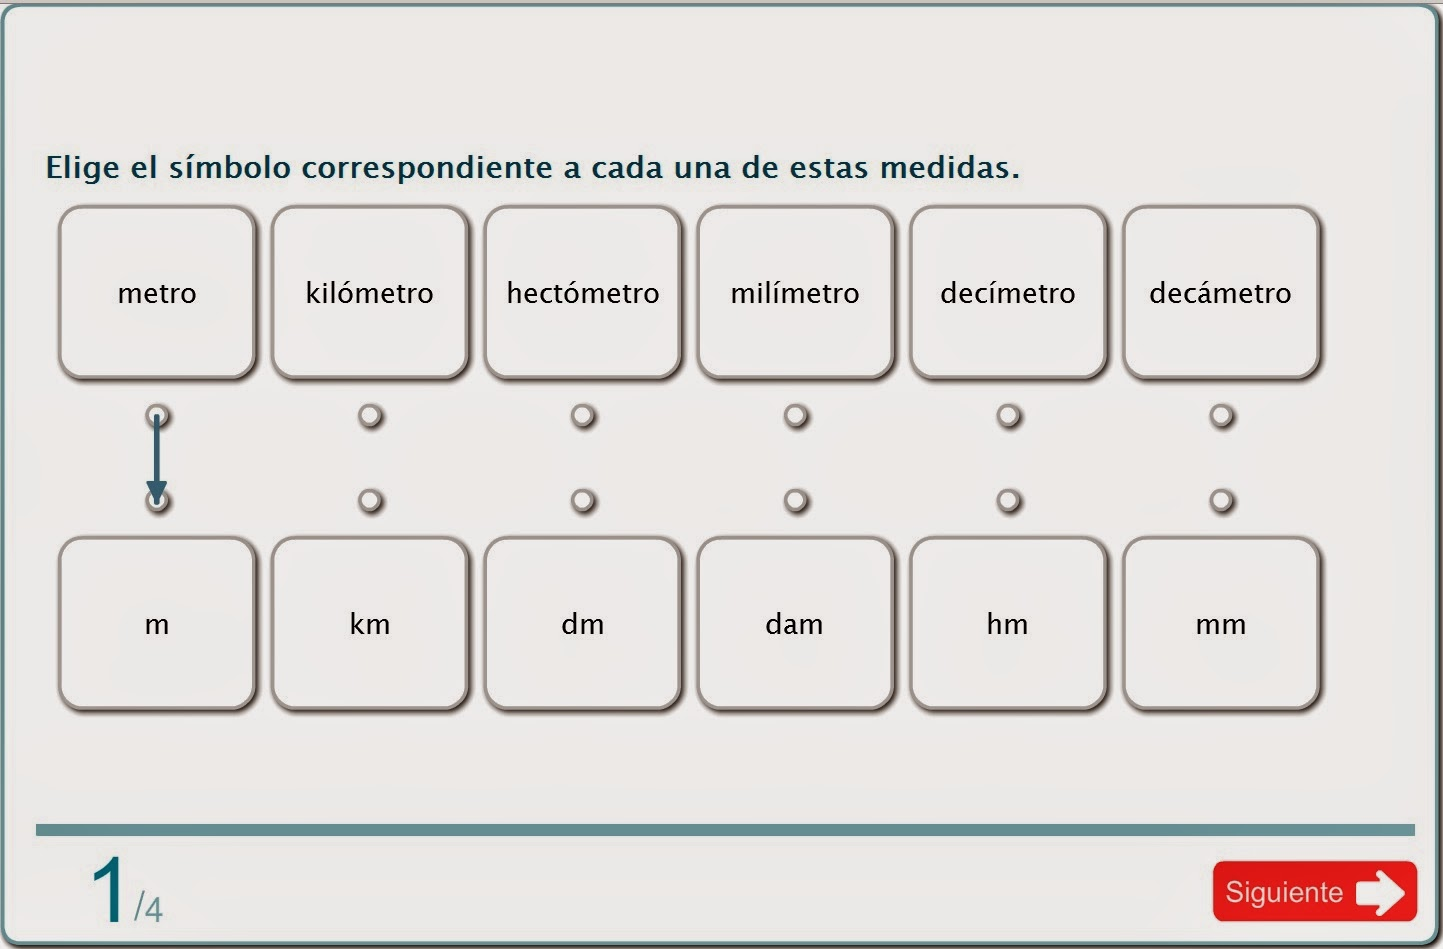 http://www.primaria.librosvivos.net/actividades/flashActividadesPrimariaPub/examen.swf?idejecucion=4182